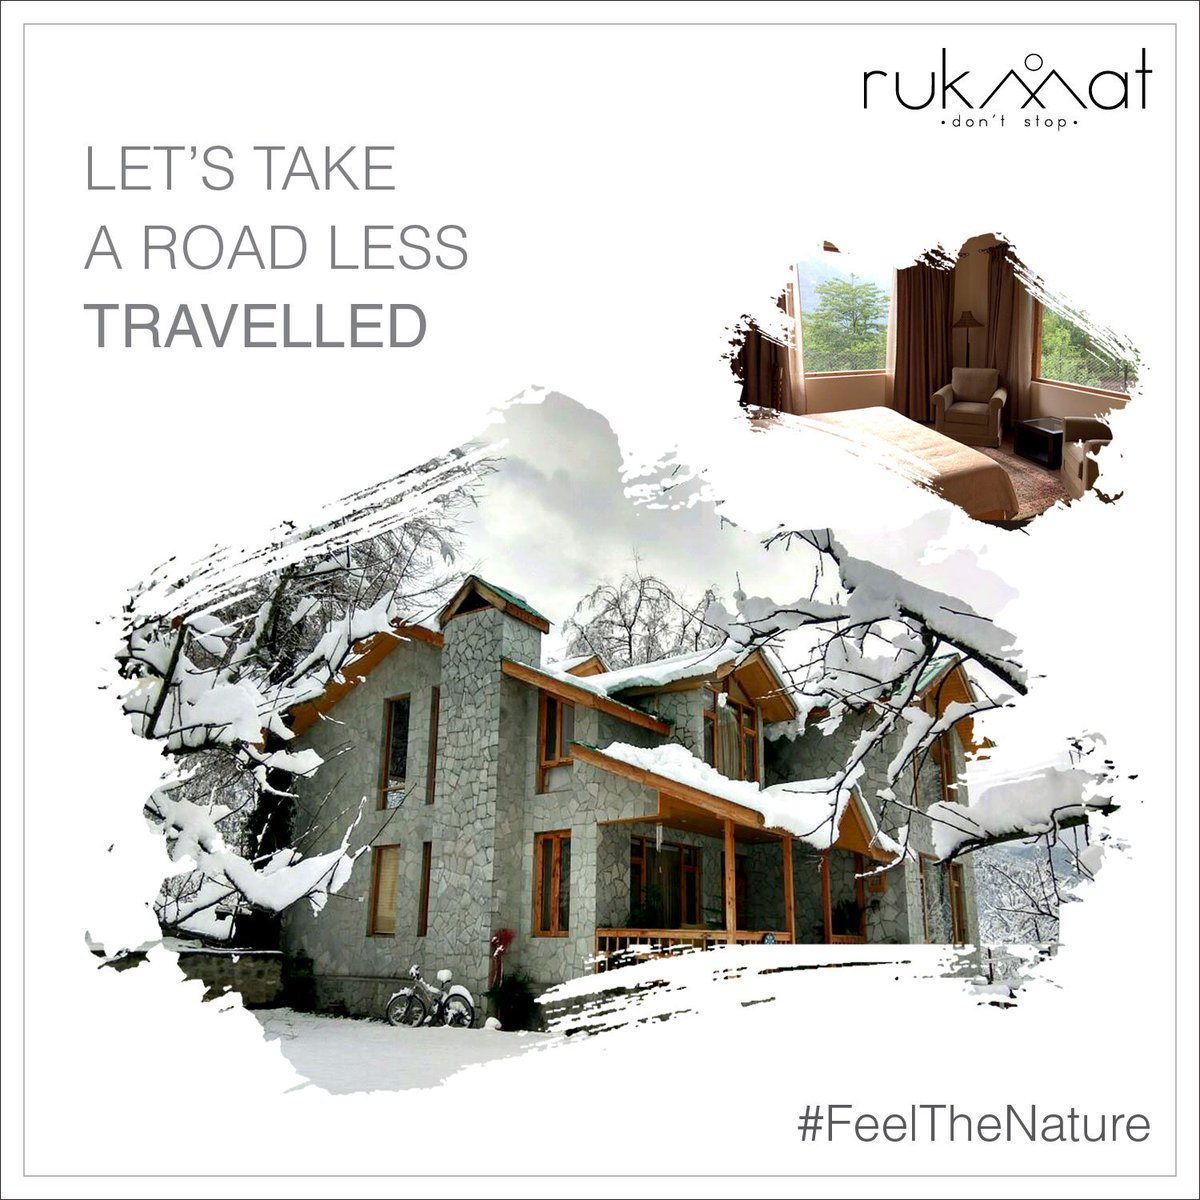 Book your next getaway to Manali- the unexplored with us. write to us on shikha@rukmat.com Book Now: http://www.rukmat.com/ #manali #himalayas #trip #adventure #wanderlust #rukmat #trekking #hiking #travel #nature #naturelover #feelthenature pic.twitter.com/hizkDze1pv